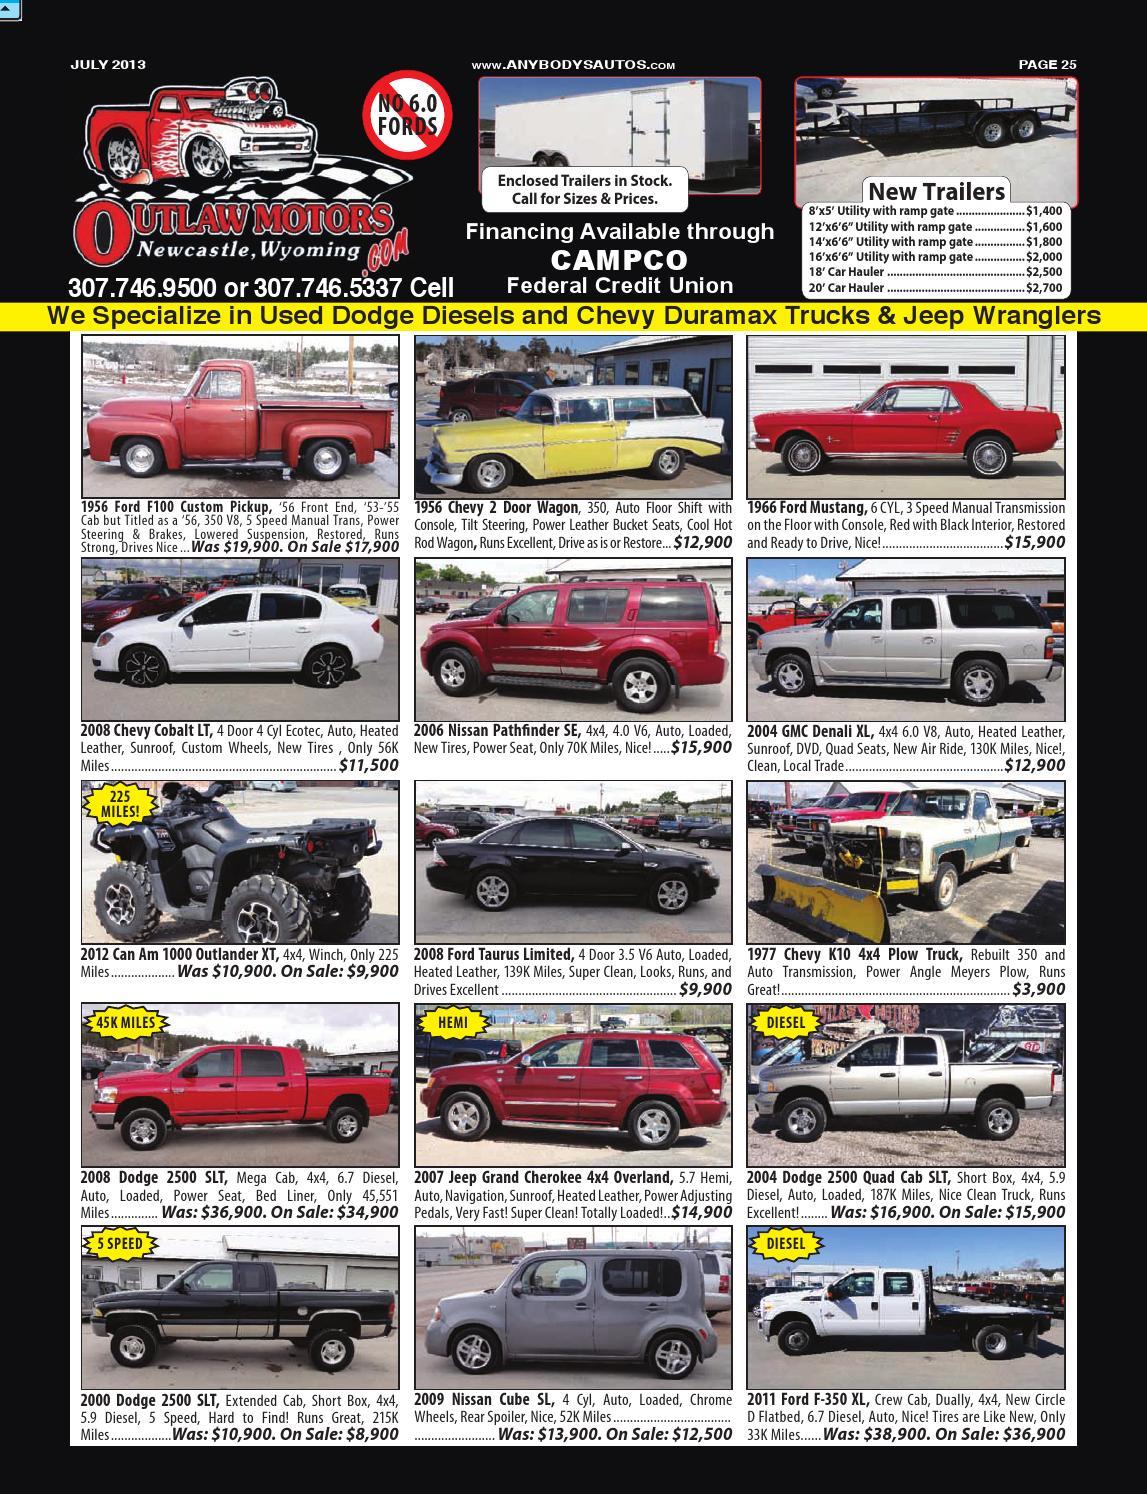 JULY 2013 Anybodys Autos News Magazine by Anybodys Autos - issuu